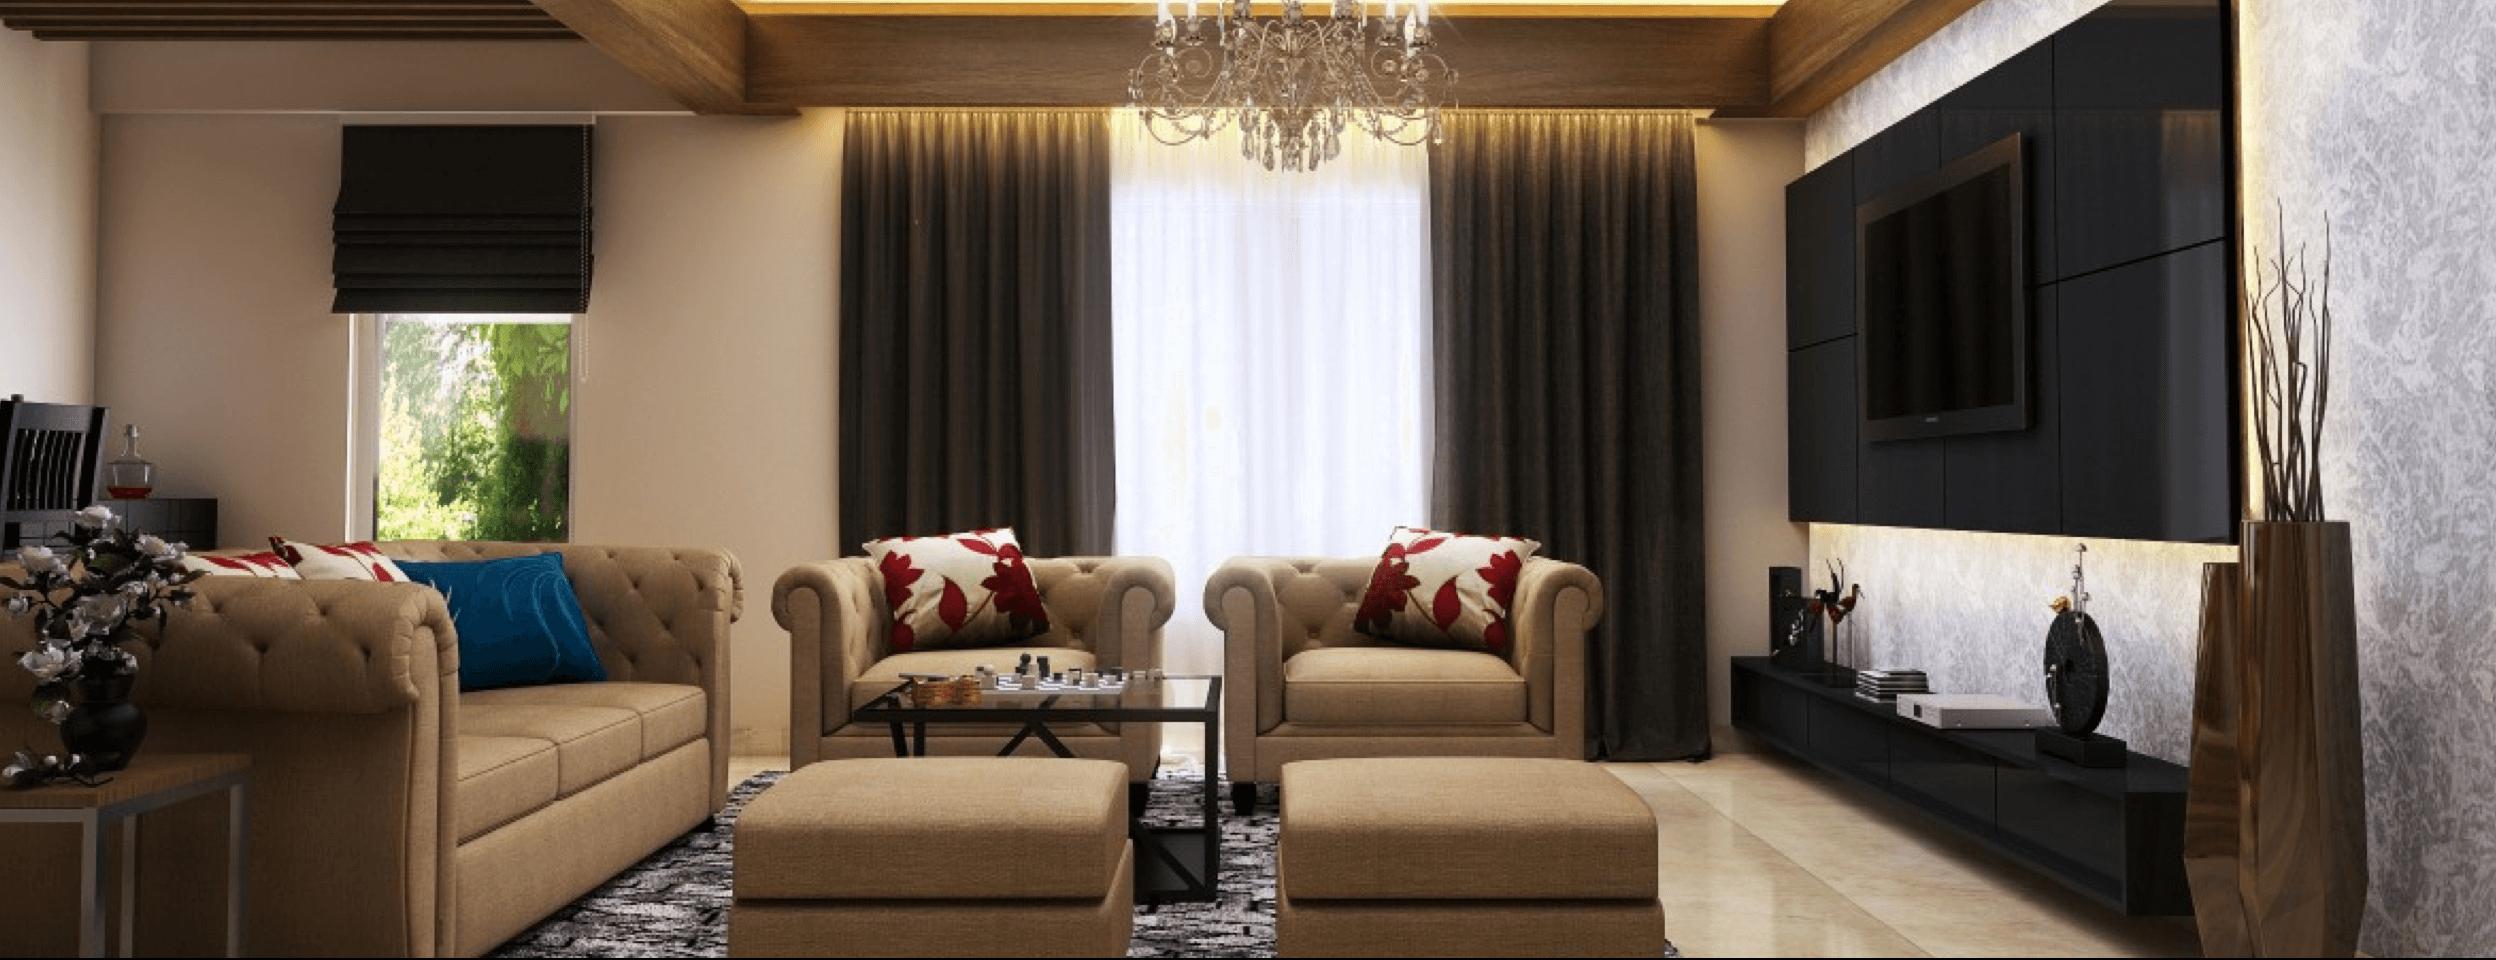 hall furniture designs